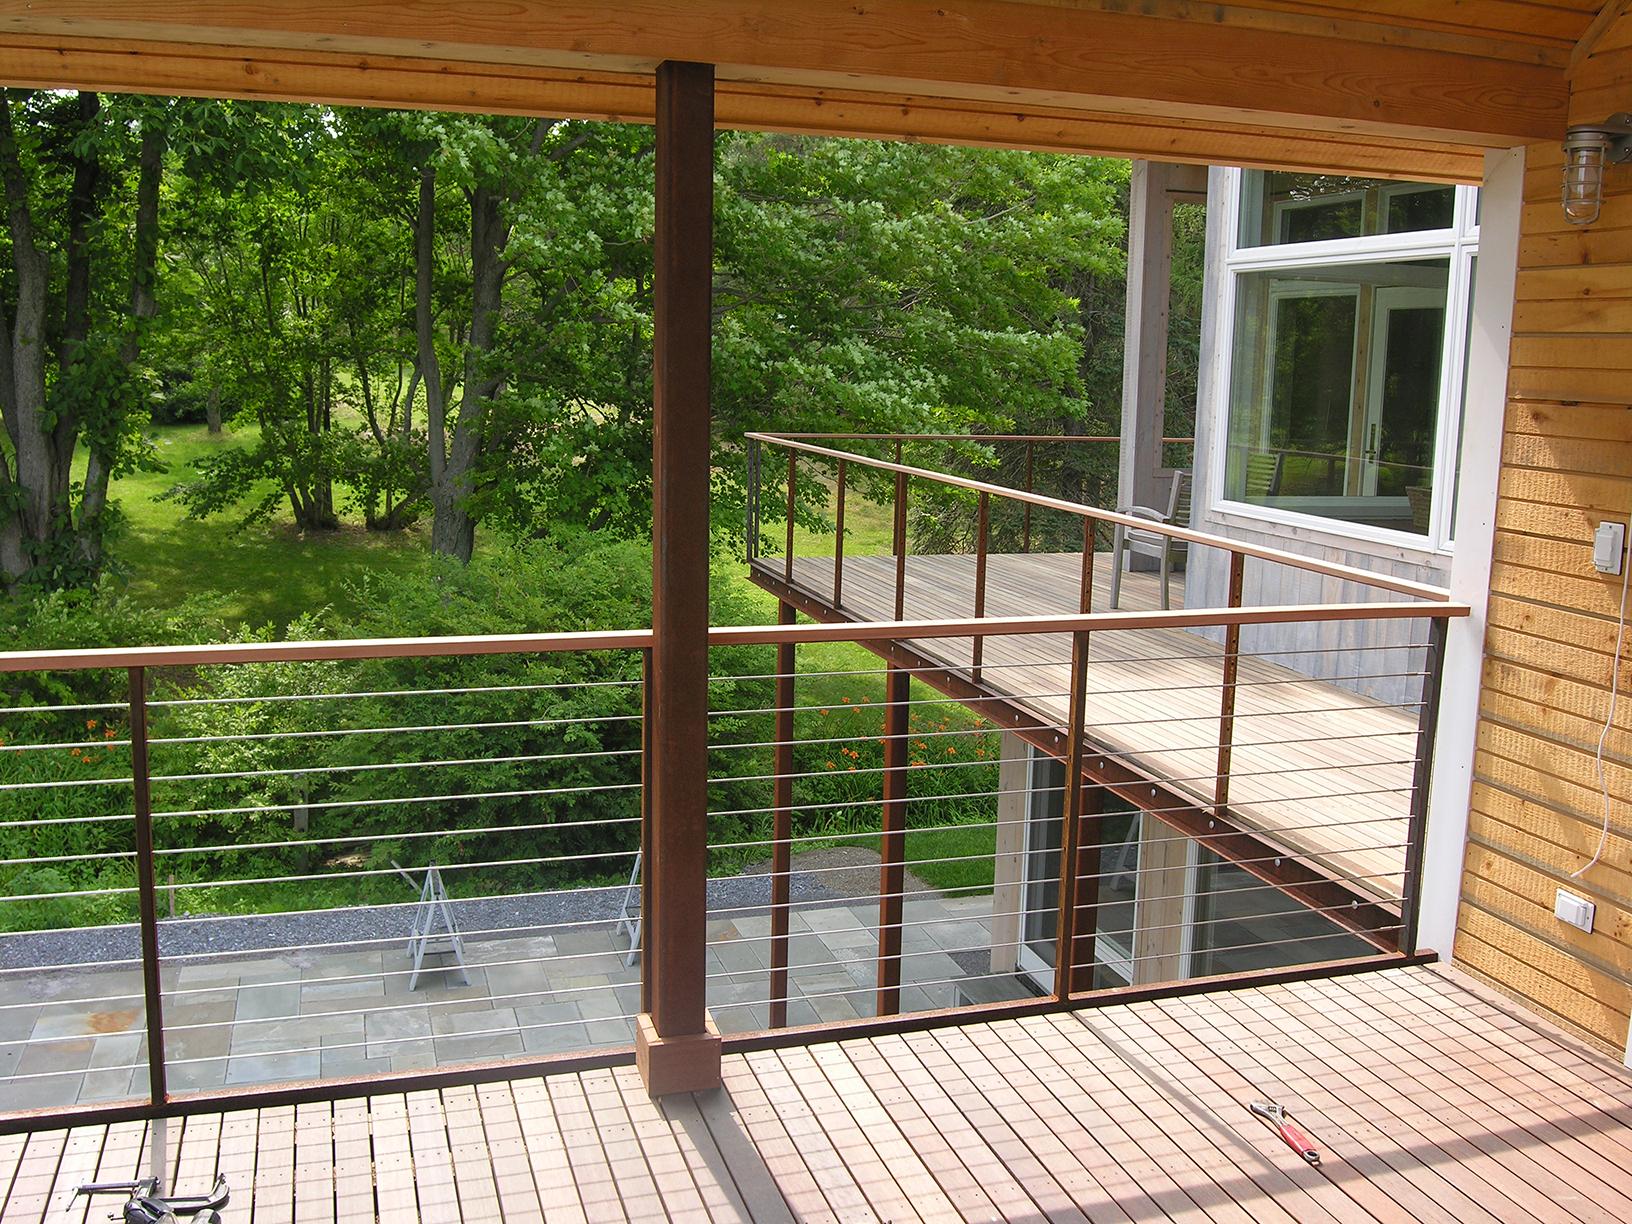 14_Balcony.JPG